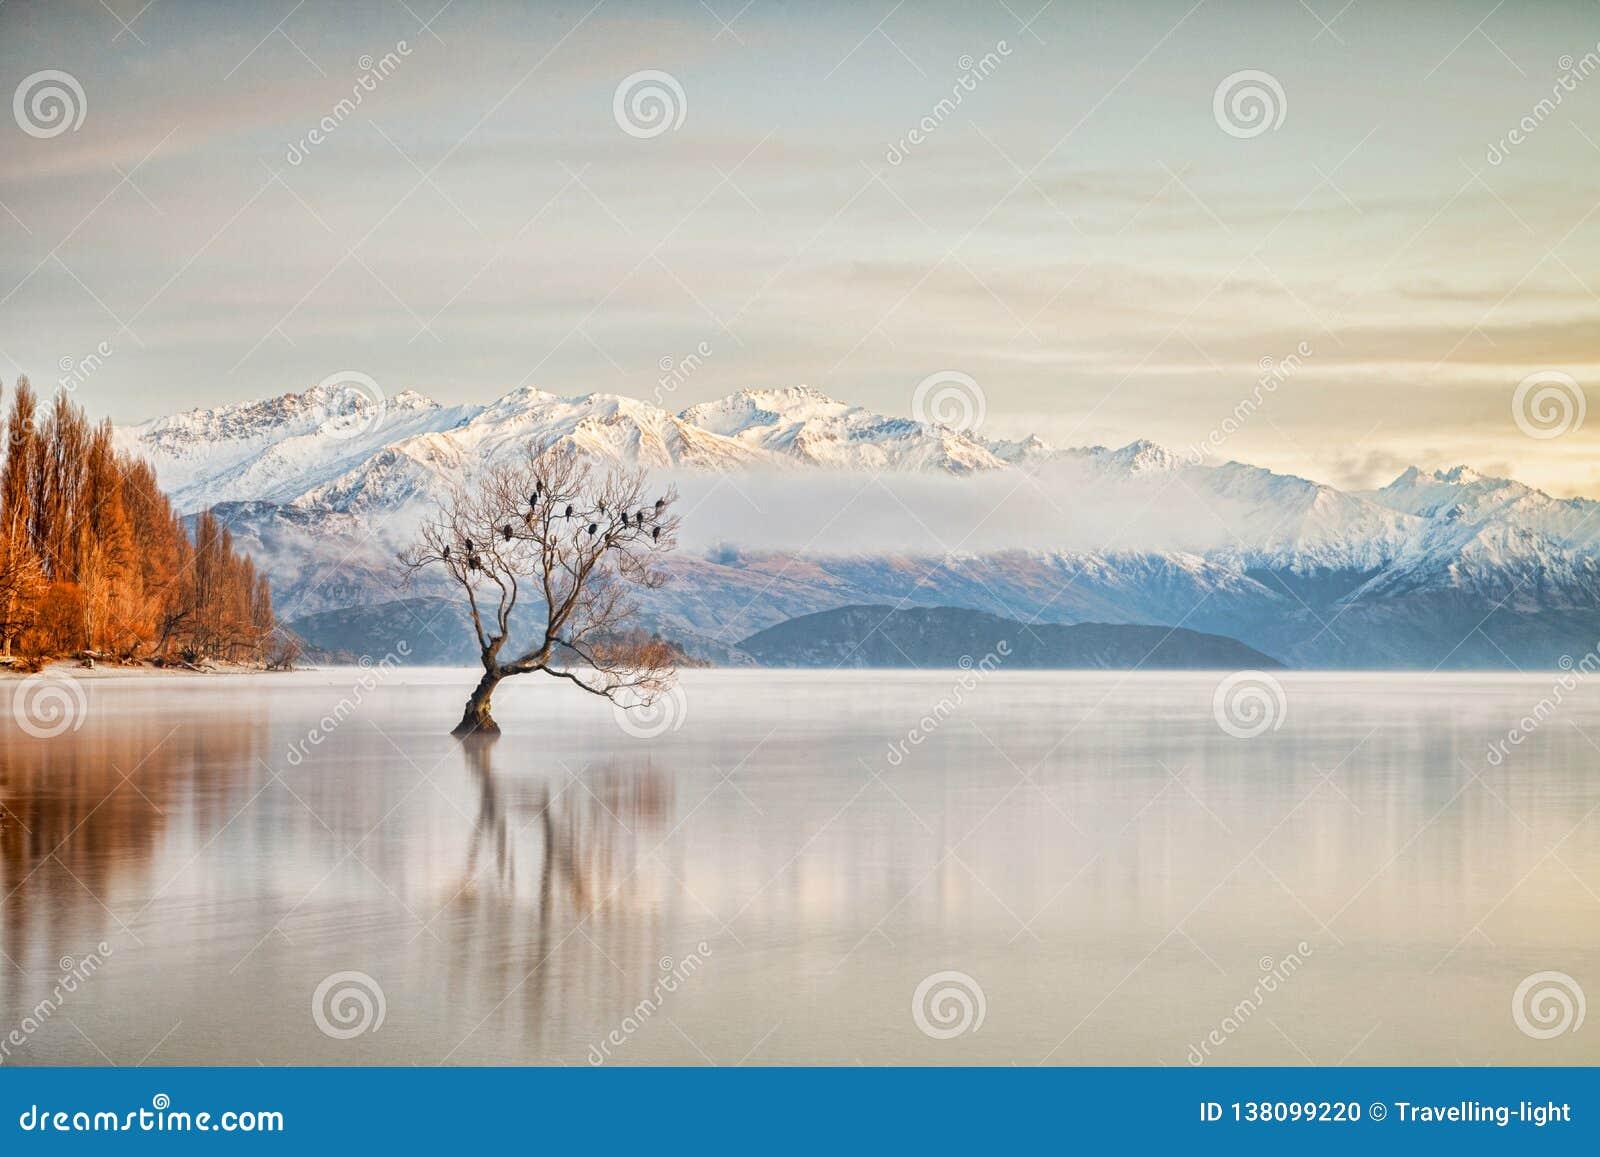 Lago Wanaka Otago Nueva Zelanda